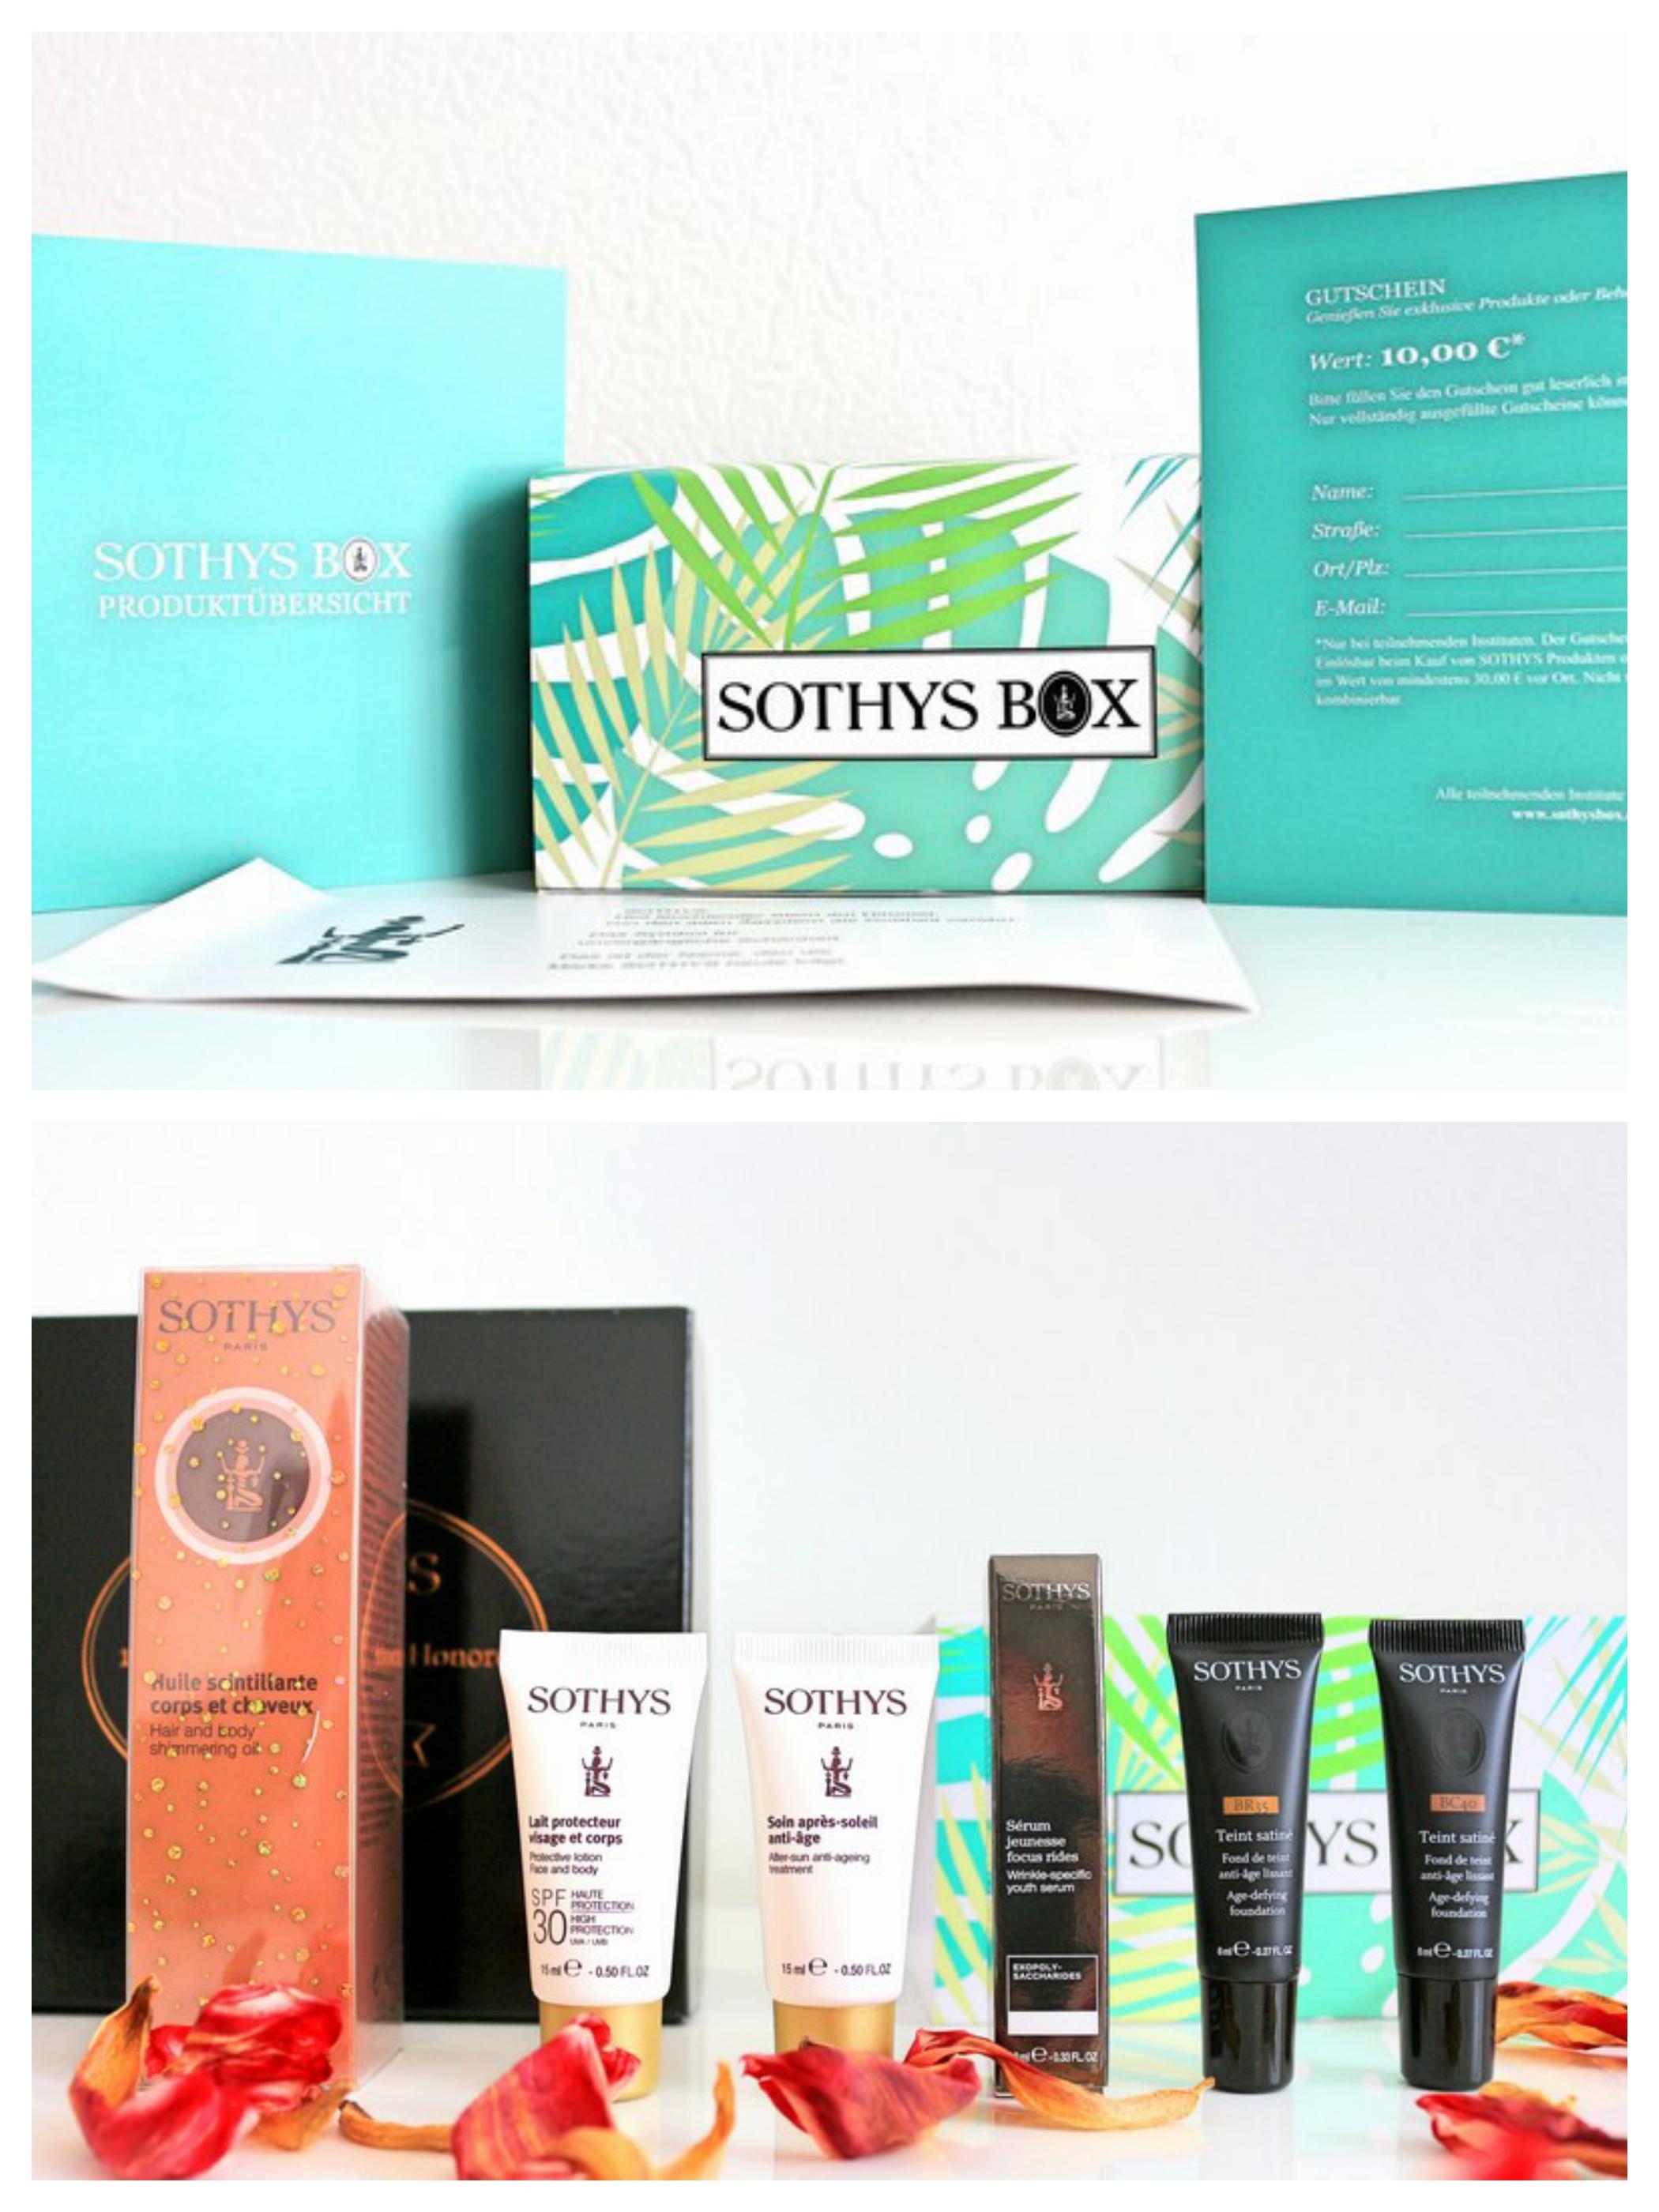 Sothys-Box